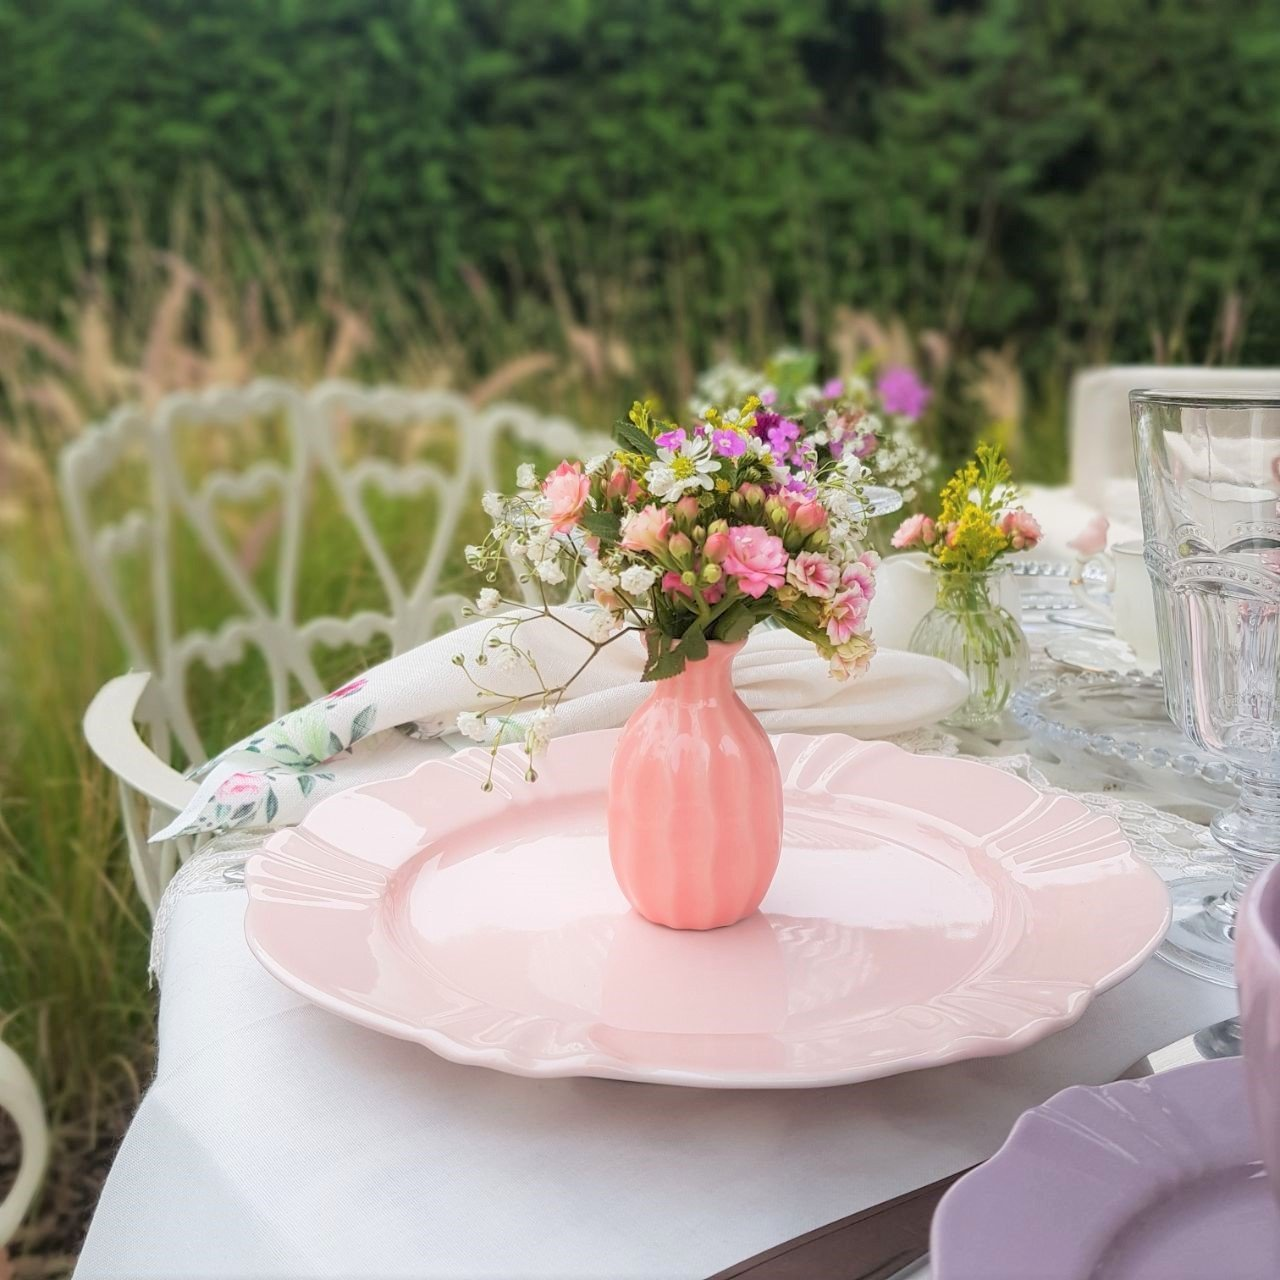 089847 prato para sobremesa 6 pecas de porcelana blush oxford casa cafe mel 2